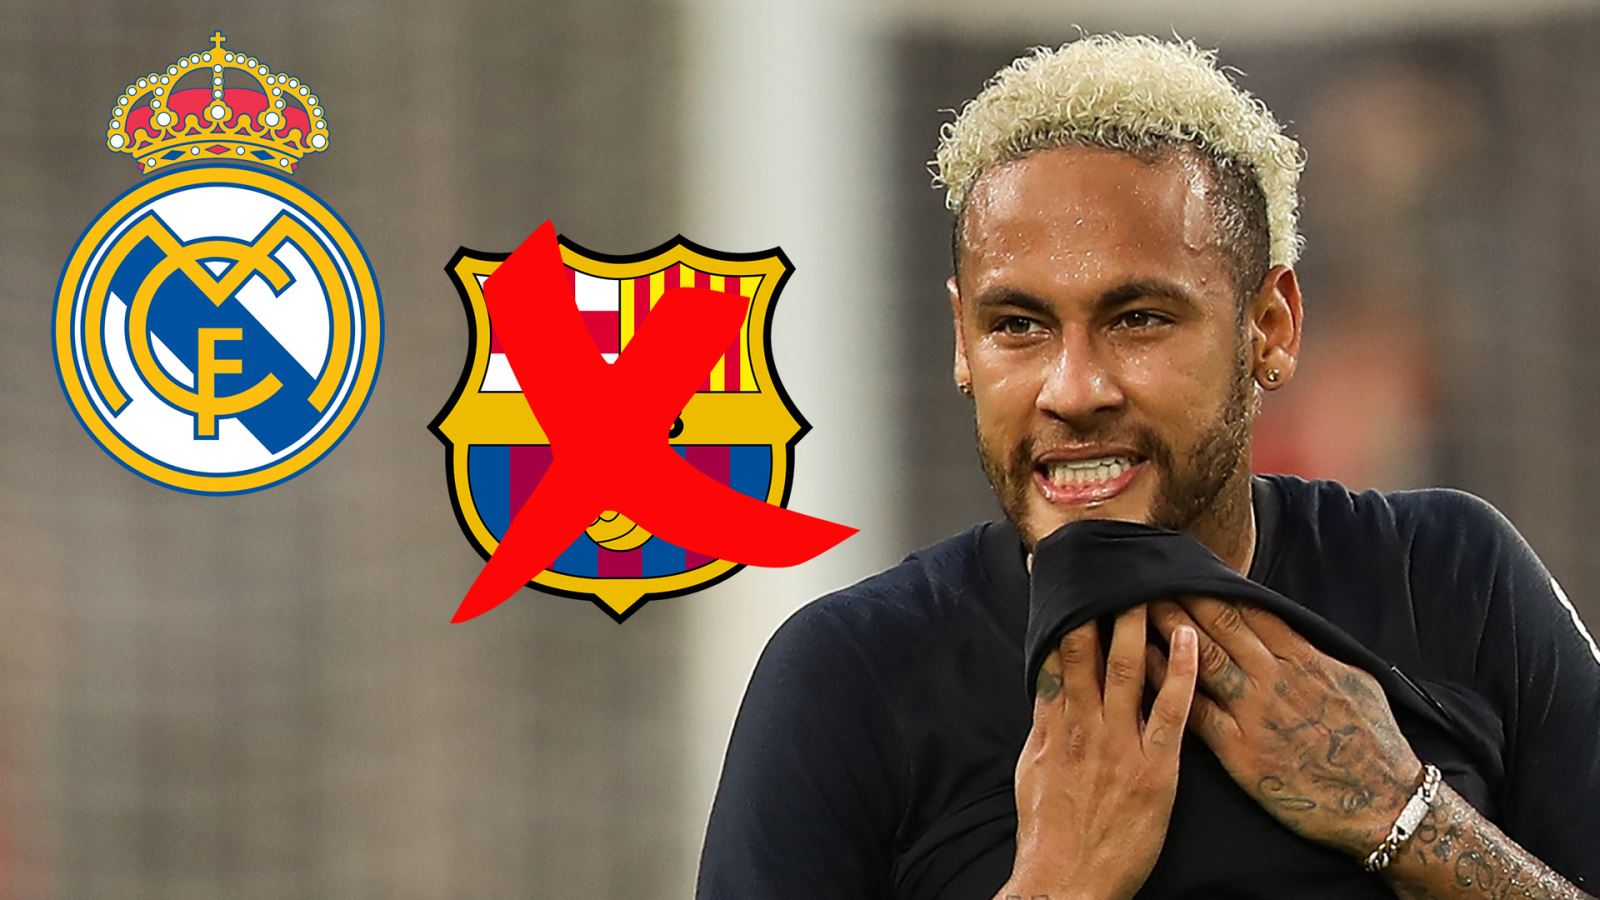 Bong da, bóng đá, lịch thi đấu bóng đá, MU, chuyển nhượng MU, chuyển nhượng, Real Madrid, Neymar, Barca, PSG, Man United, Man City, Maguire, Rojo, Bayern, Leroy Sane